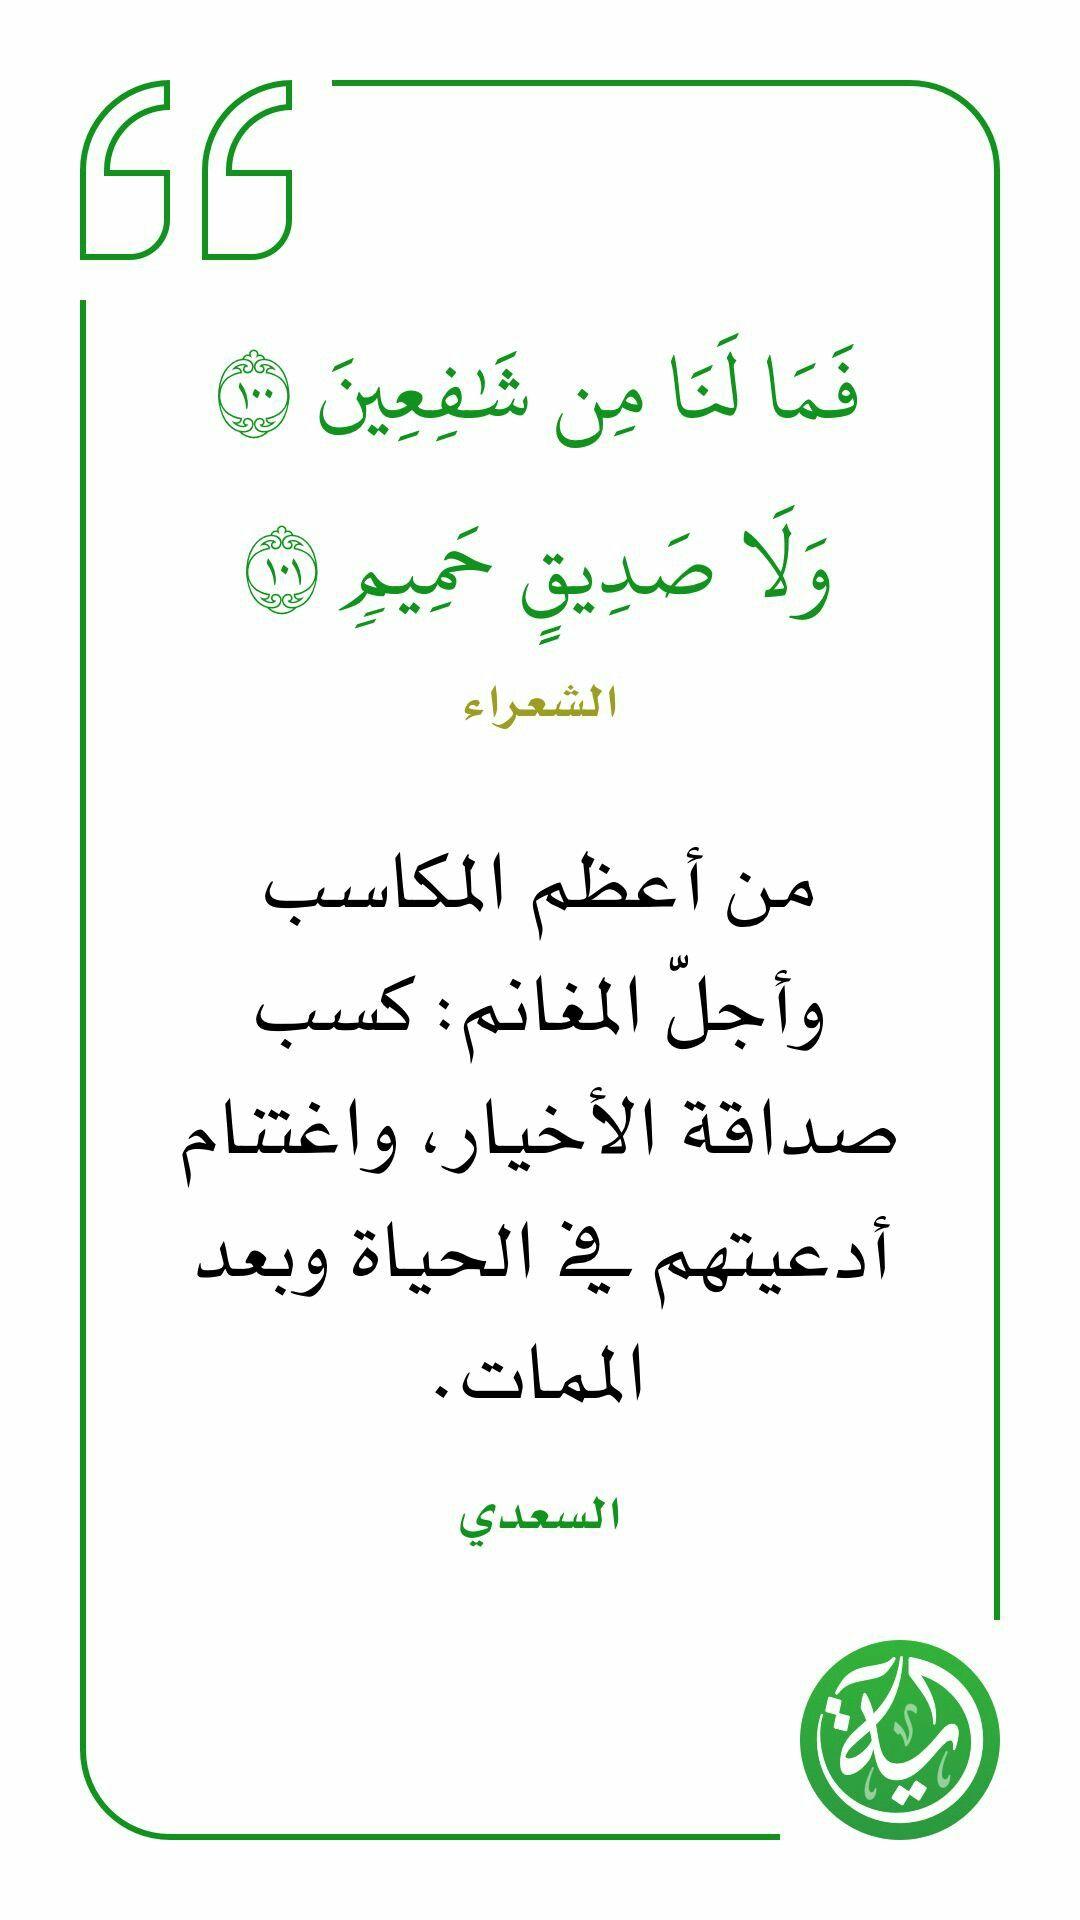 Pin By Hanan Karkoush On لوح للكتابة Quran Quotes Words Quotes Life Quotes